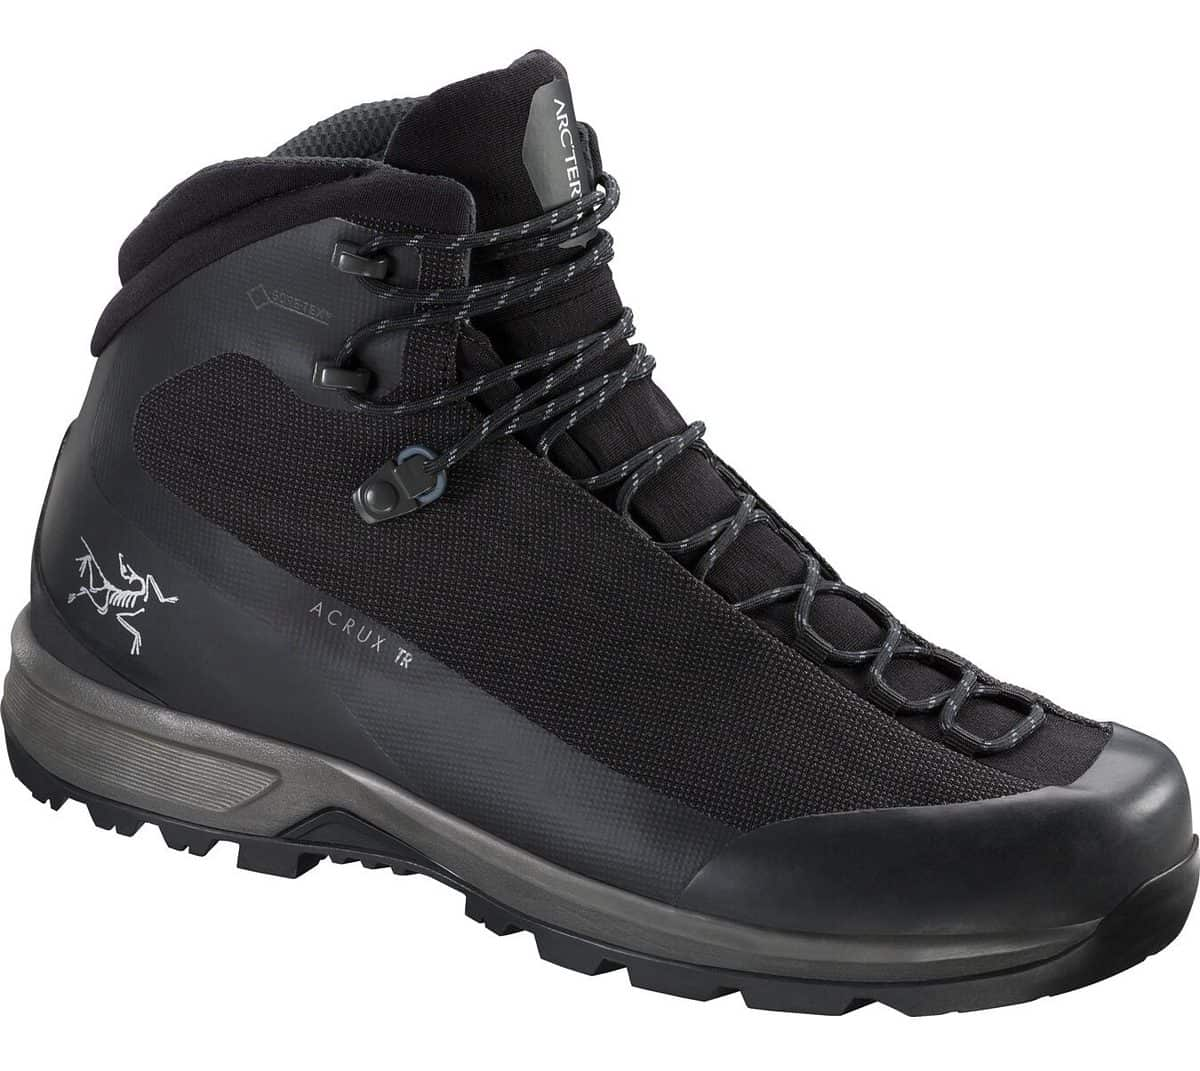 Acr'teryx TR GTX Boot